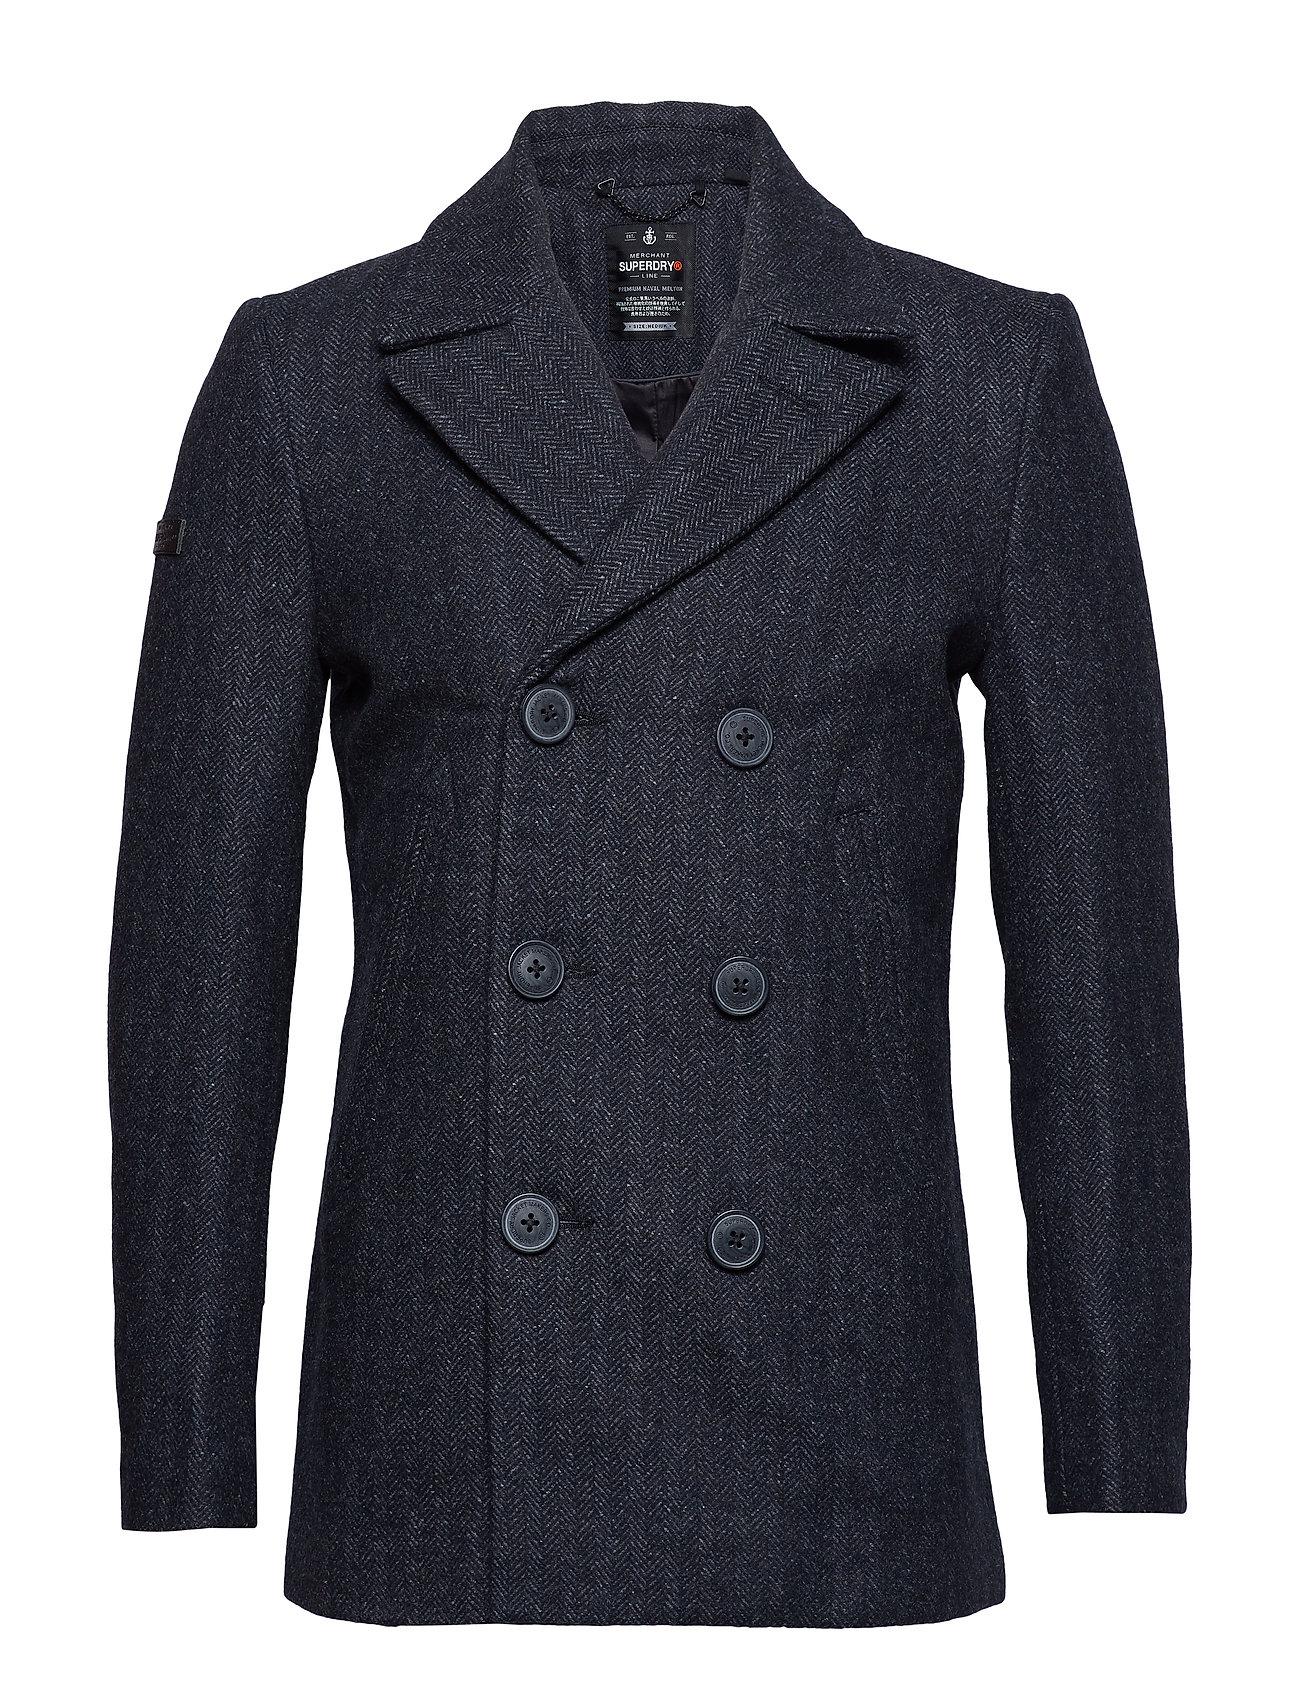 SUPERDRY Rookie Merchant Line Peacoat Wollmantel Mantel Grau SUPERDRY